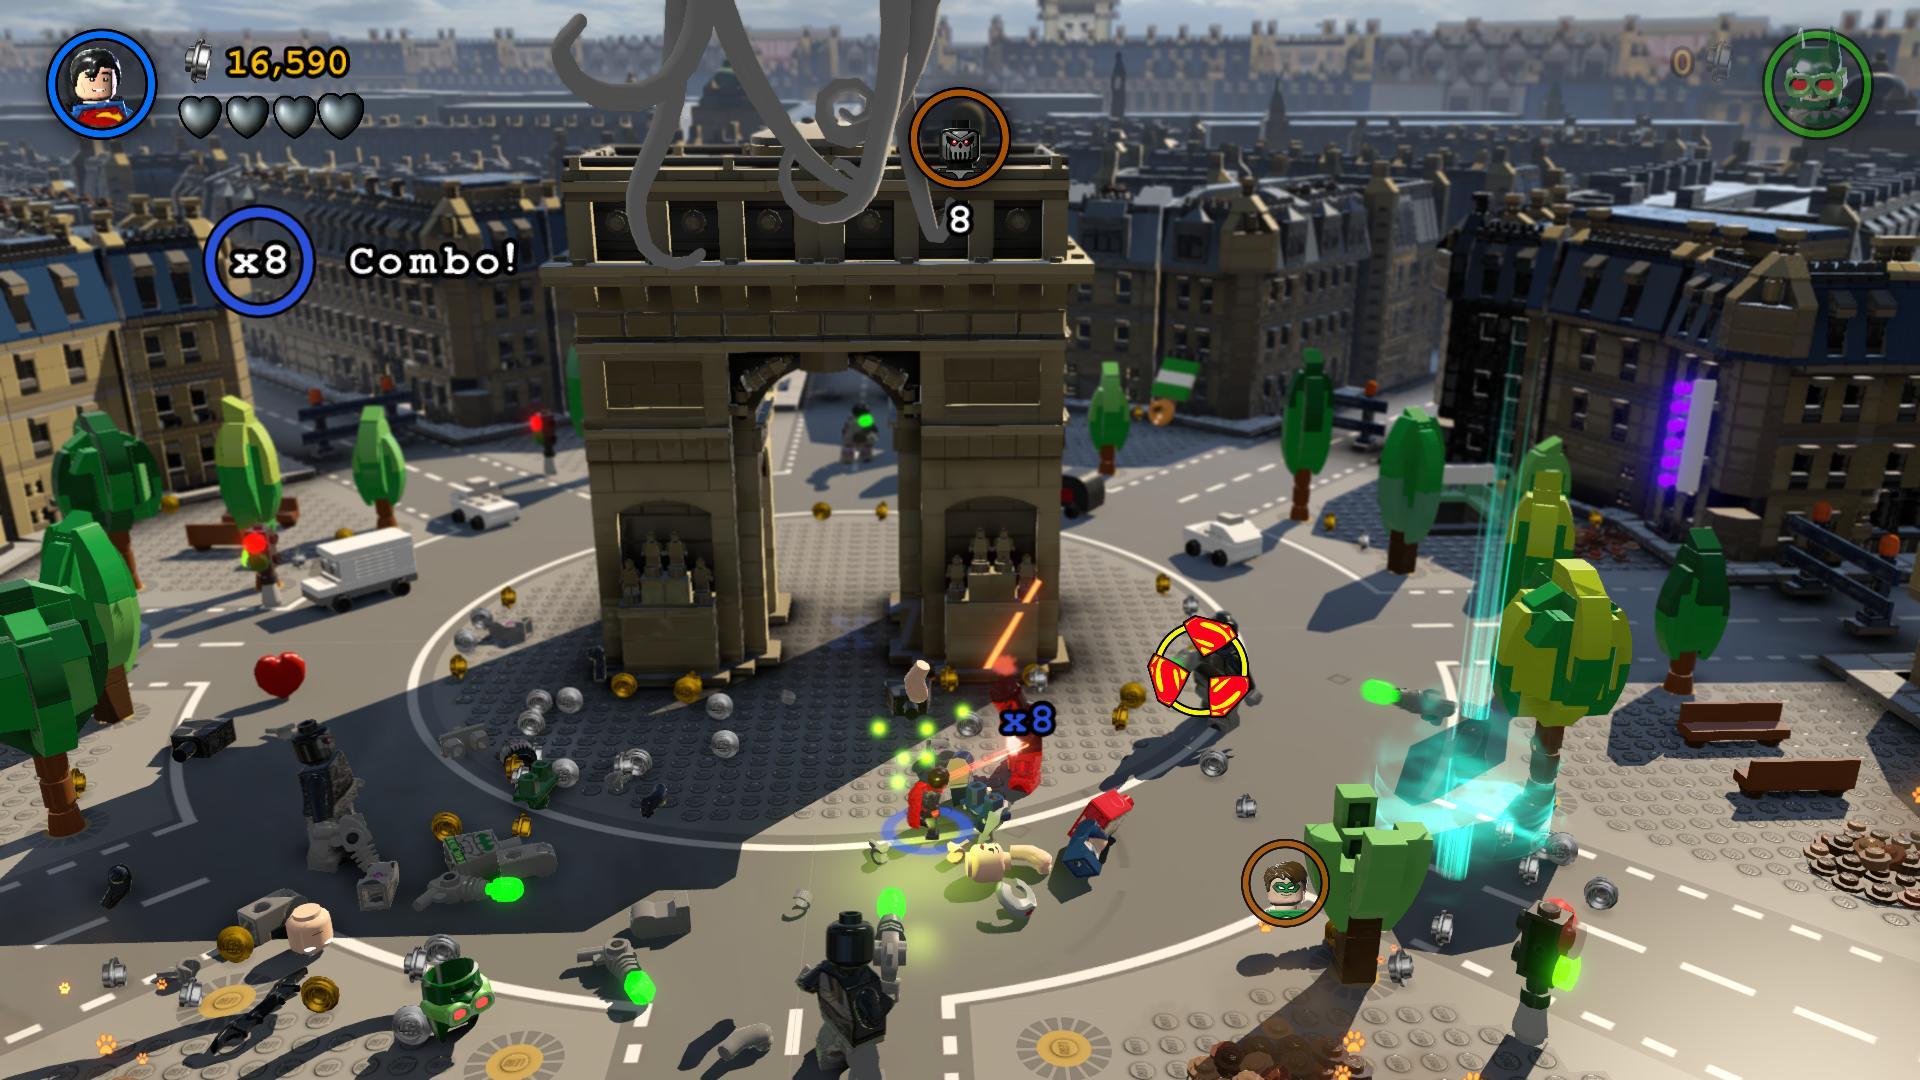 LEGO Batman 3: Beyond Gotham – netopýr znovu zasahuje 102749